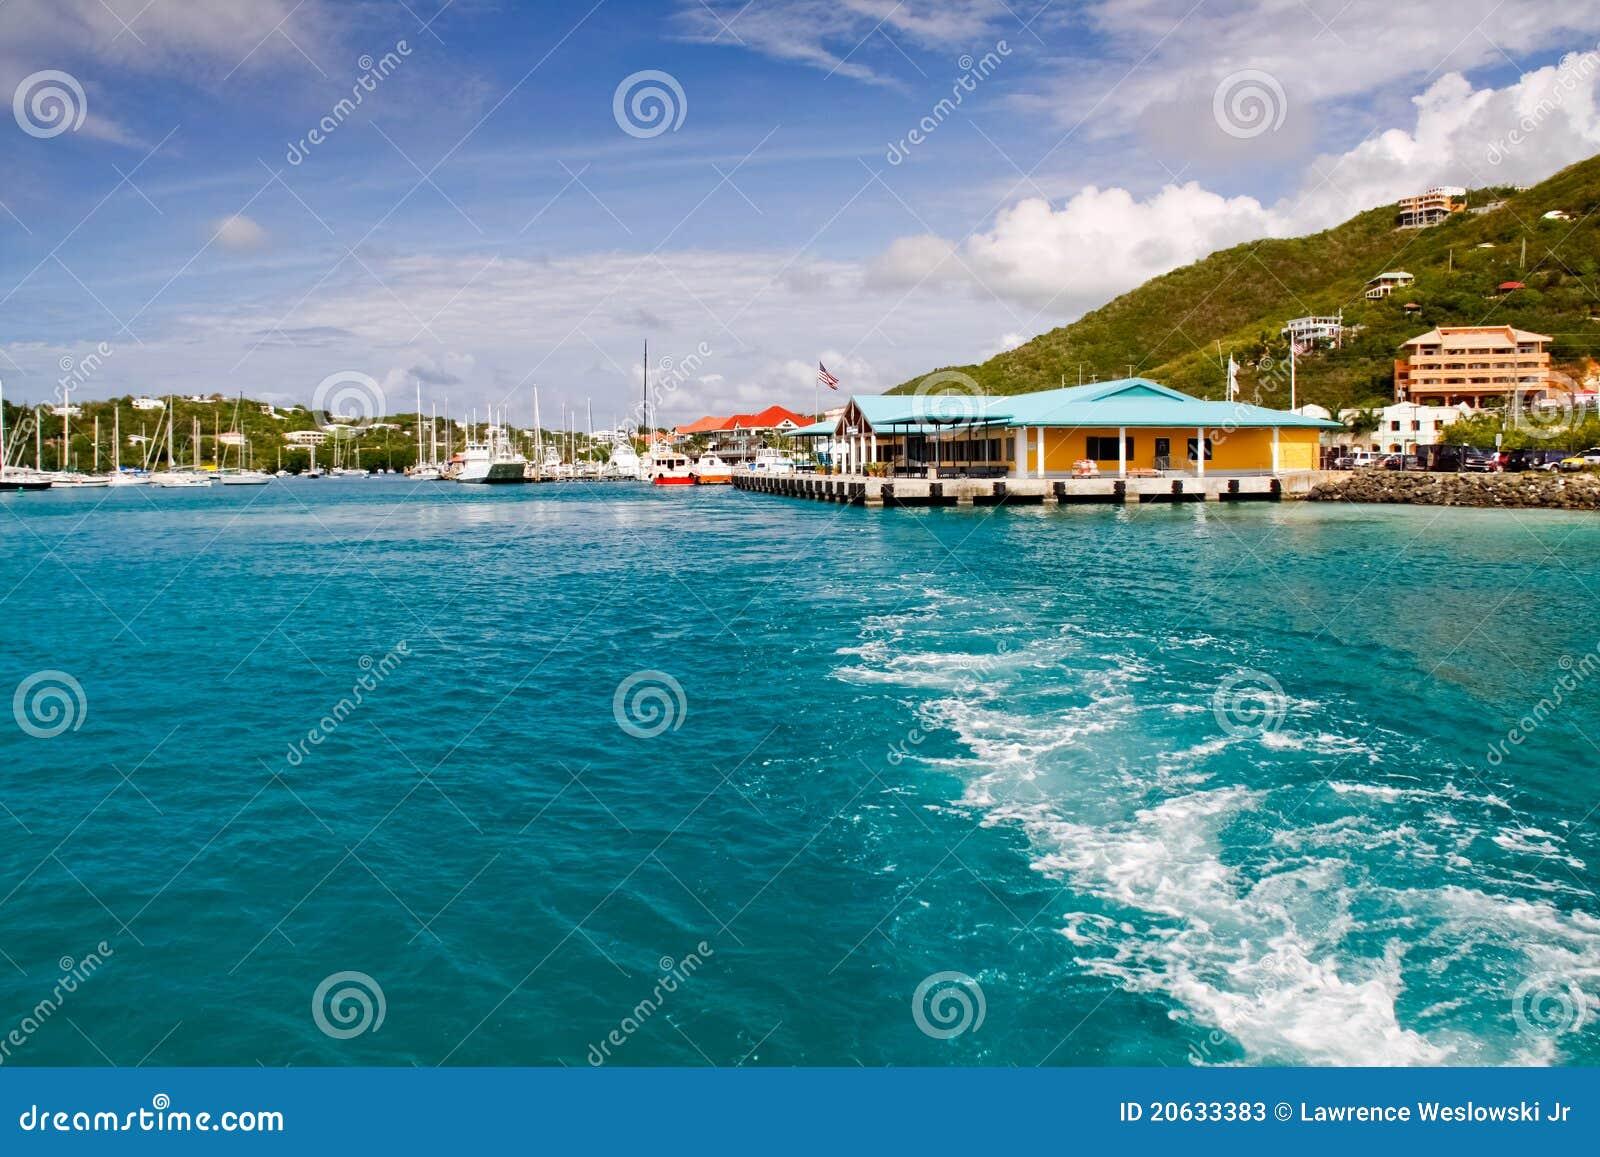 St Thomas Virgin Islands Red Hook Ferry